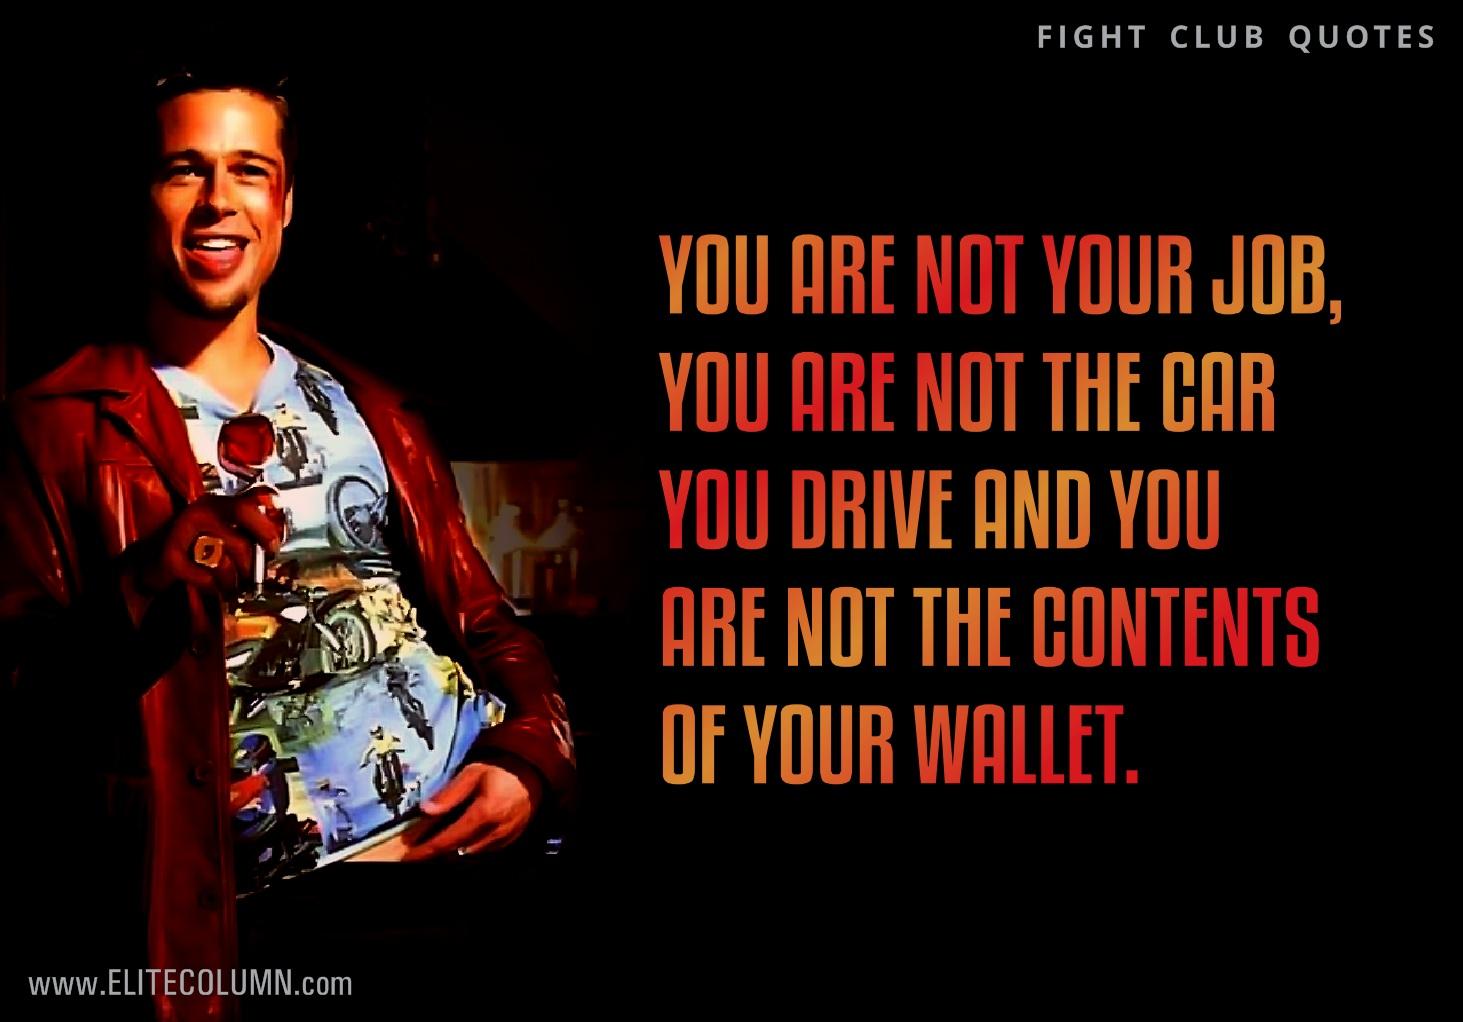 Fight Club Quotes 7 | EliteColumn